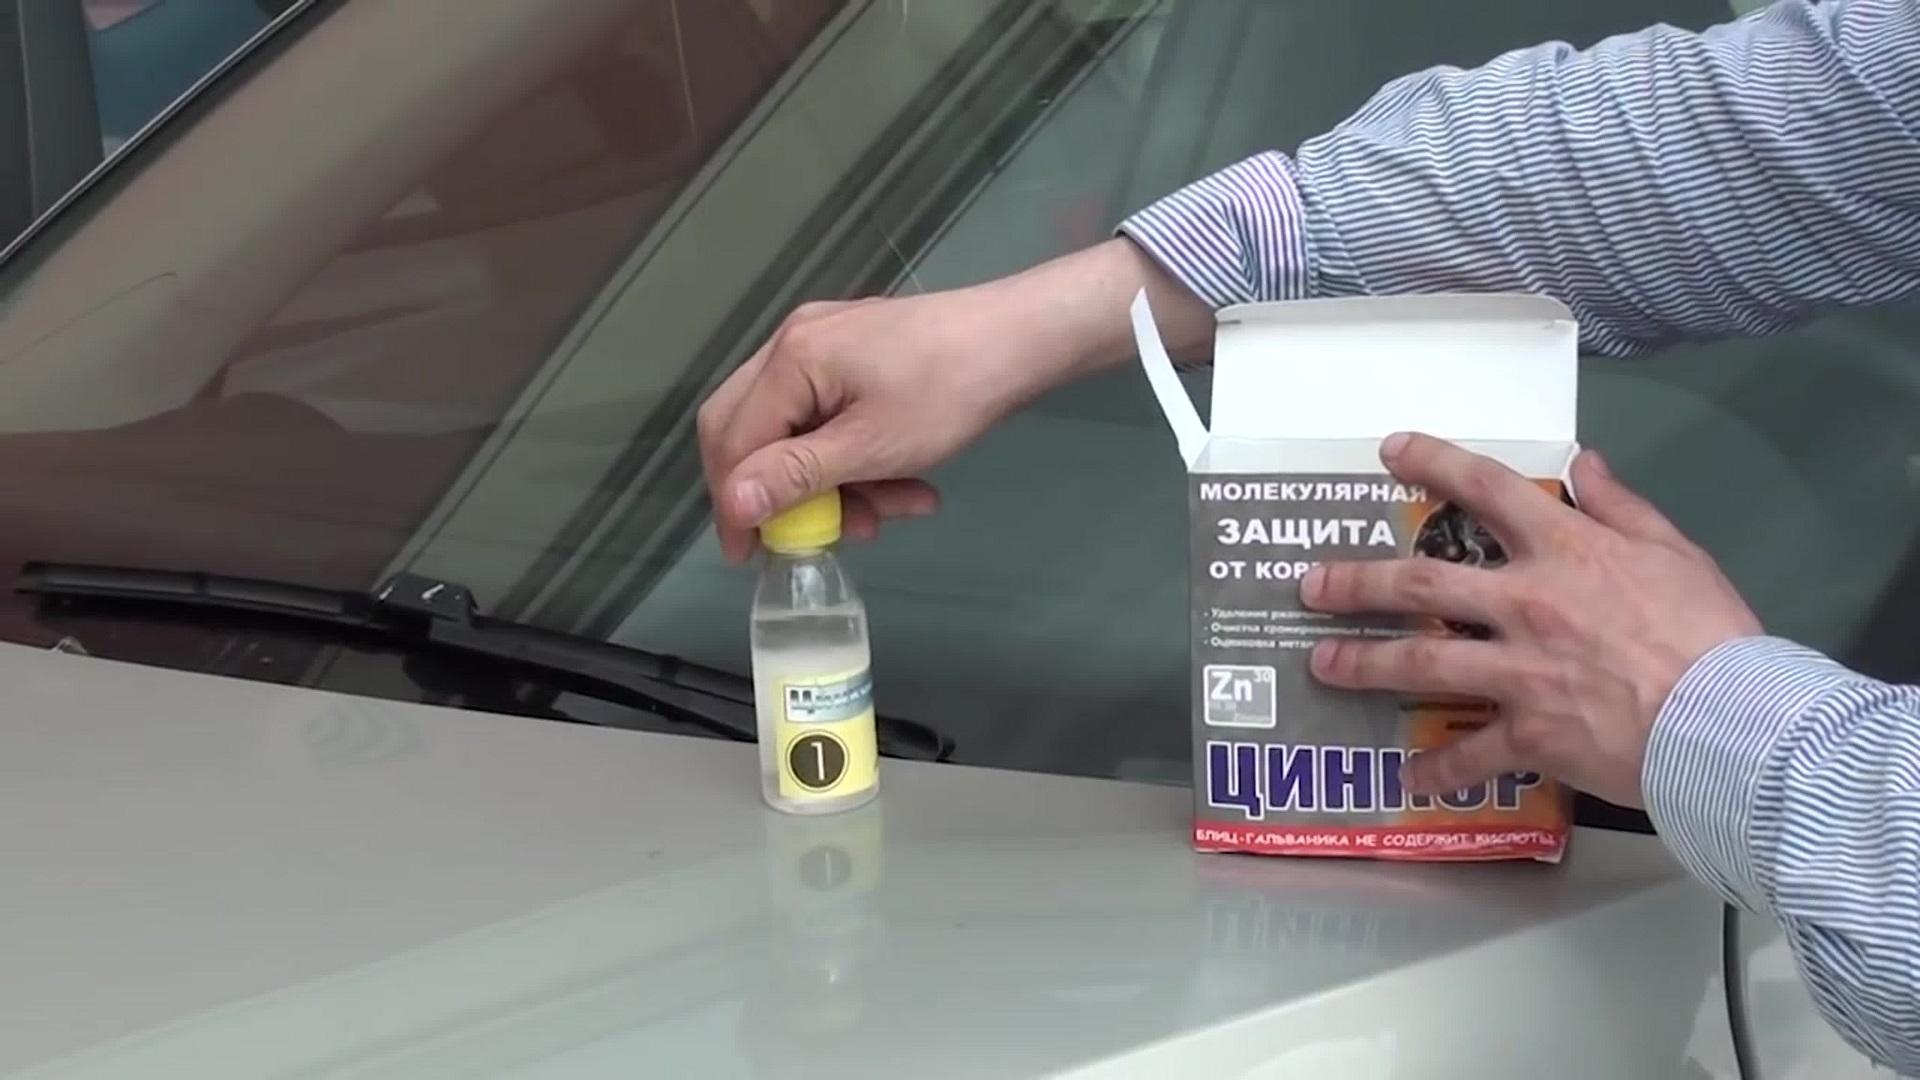 Цинкор для обработки кузова автомобиля